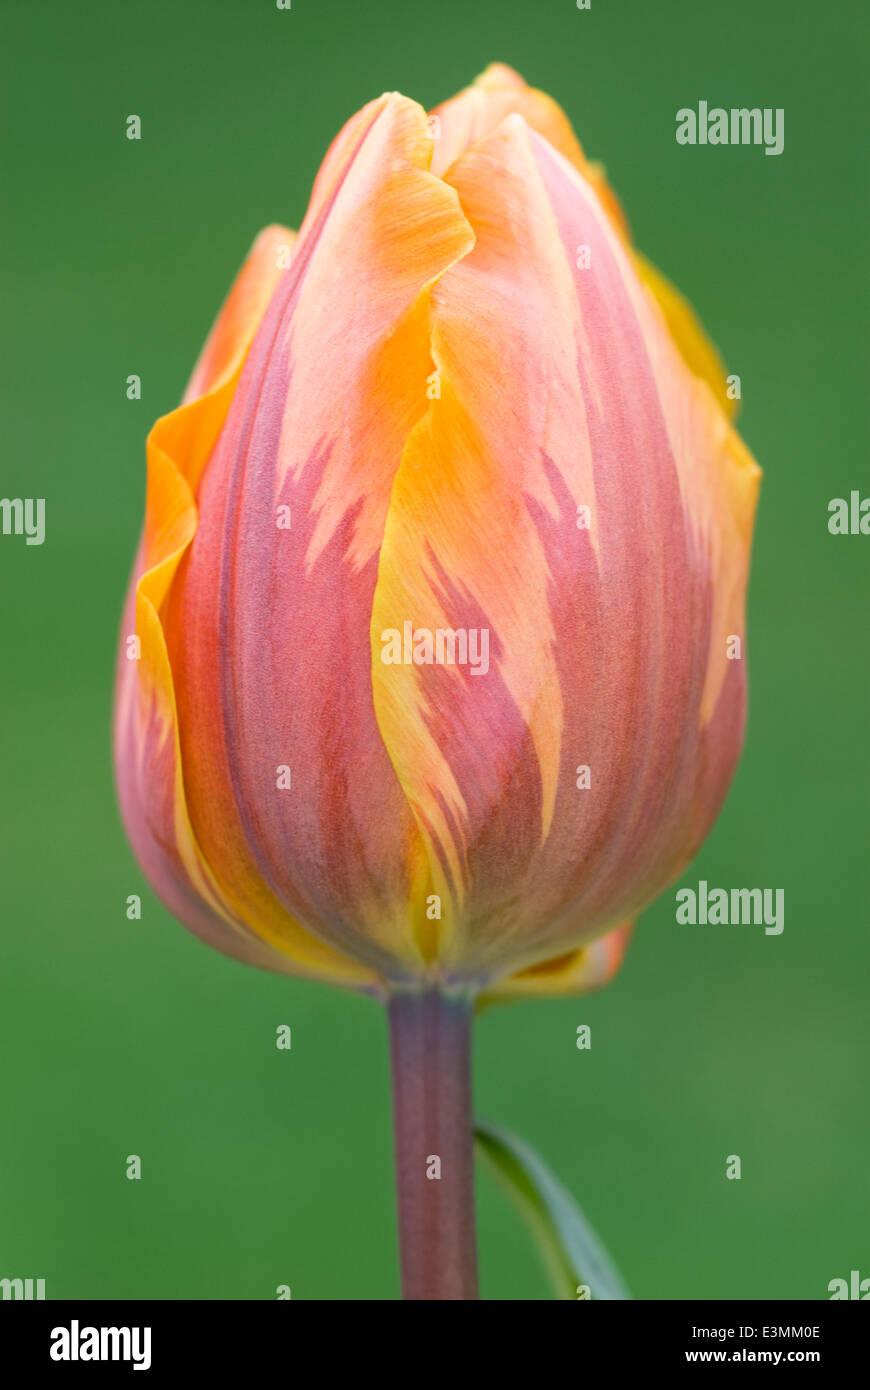 Tulipa 'Prinses Irene' syn. T. 'Princess Irene', Triumph Group, Tulip. Bulb, April. Orange flower. - Stock Image